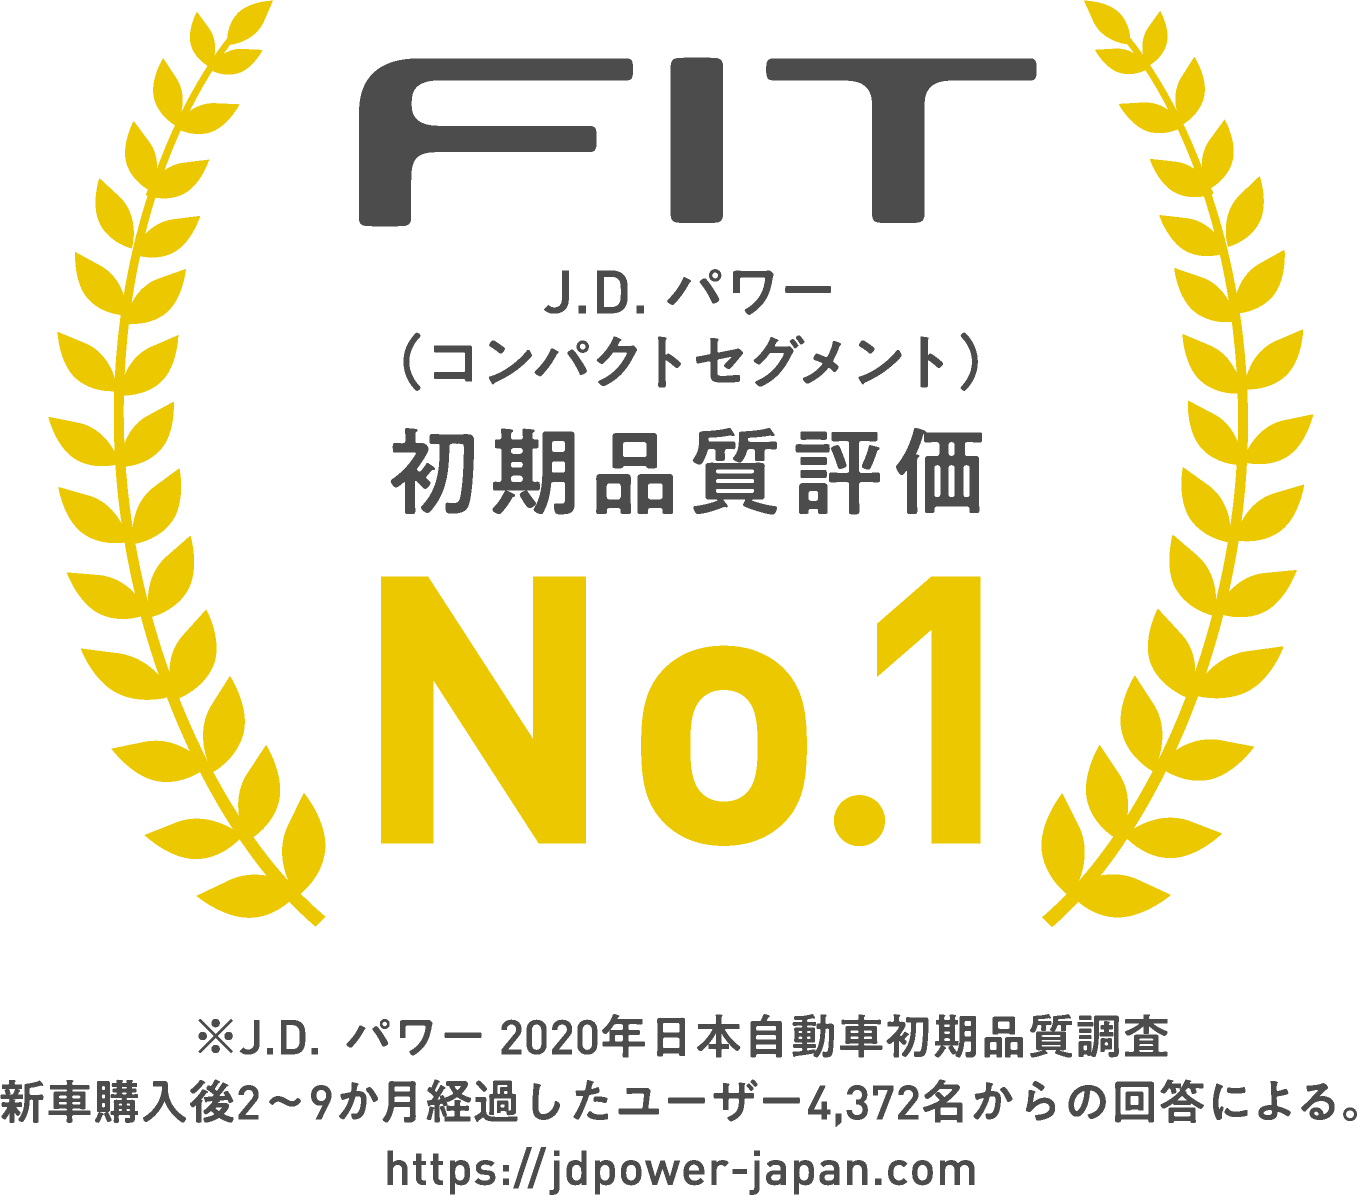 FIT J.D. パワー(コンパクトセグメント) 初期品質評価 No.1